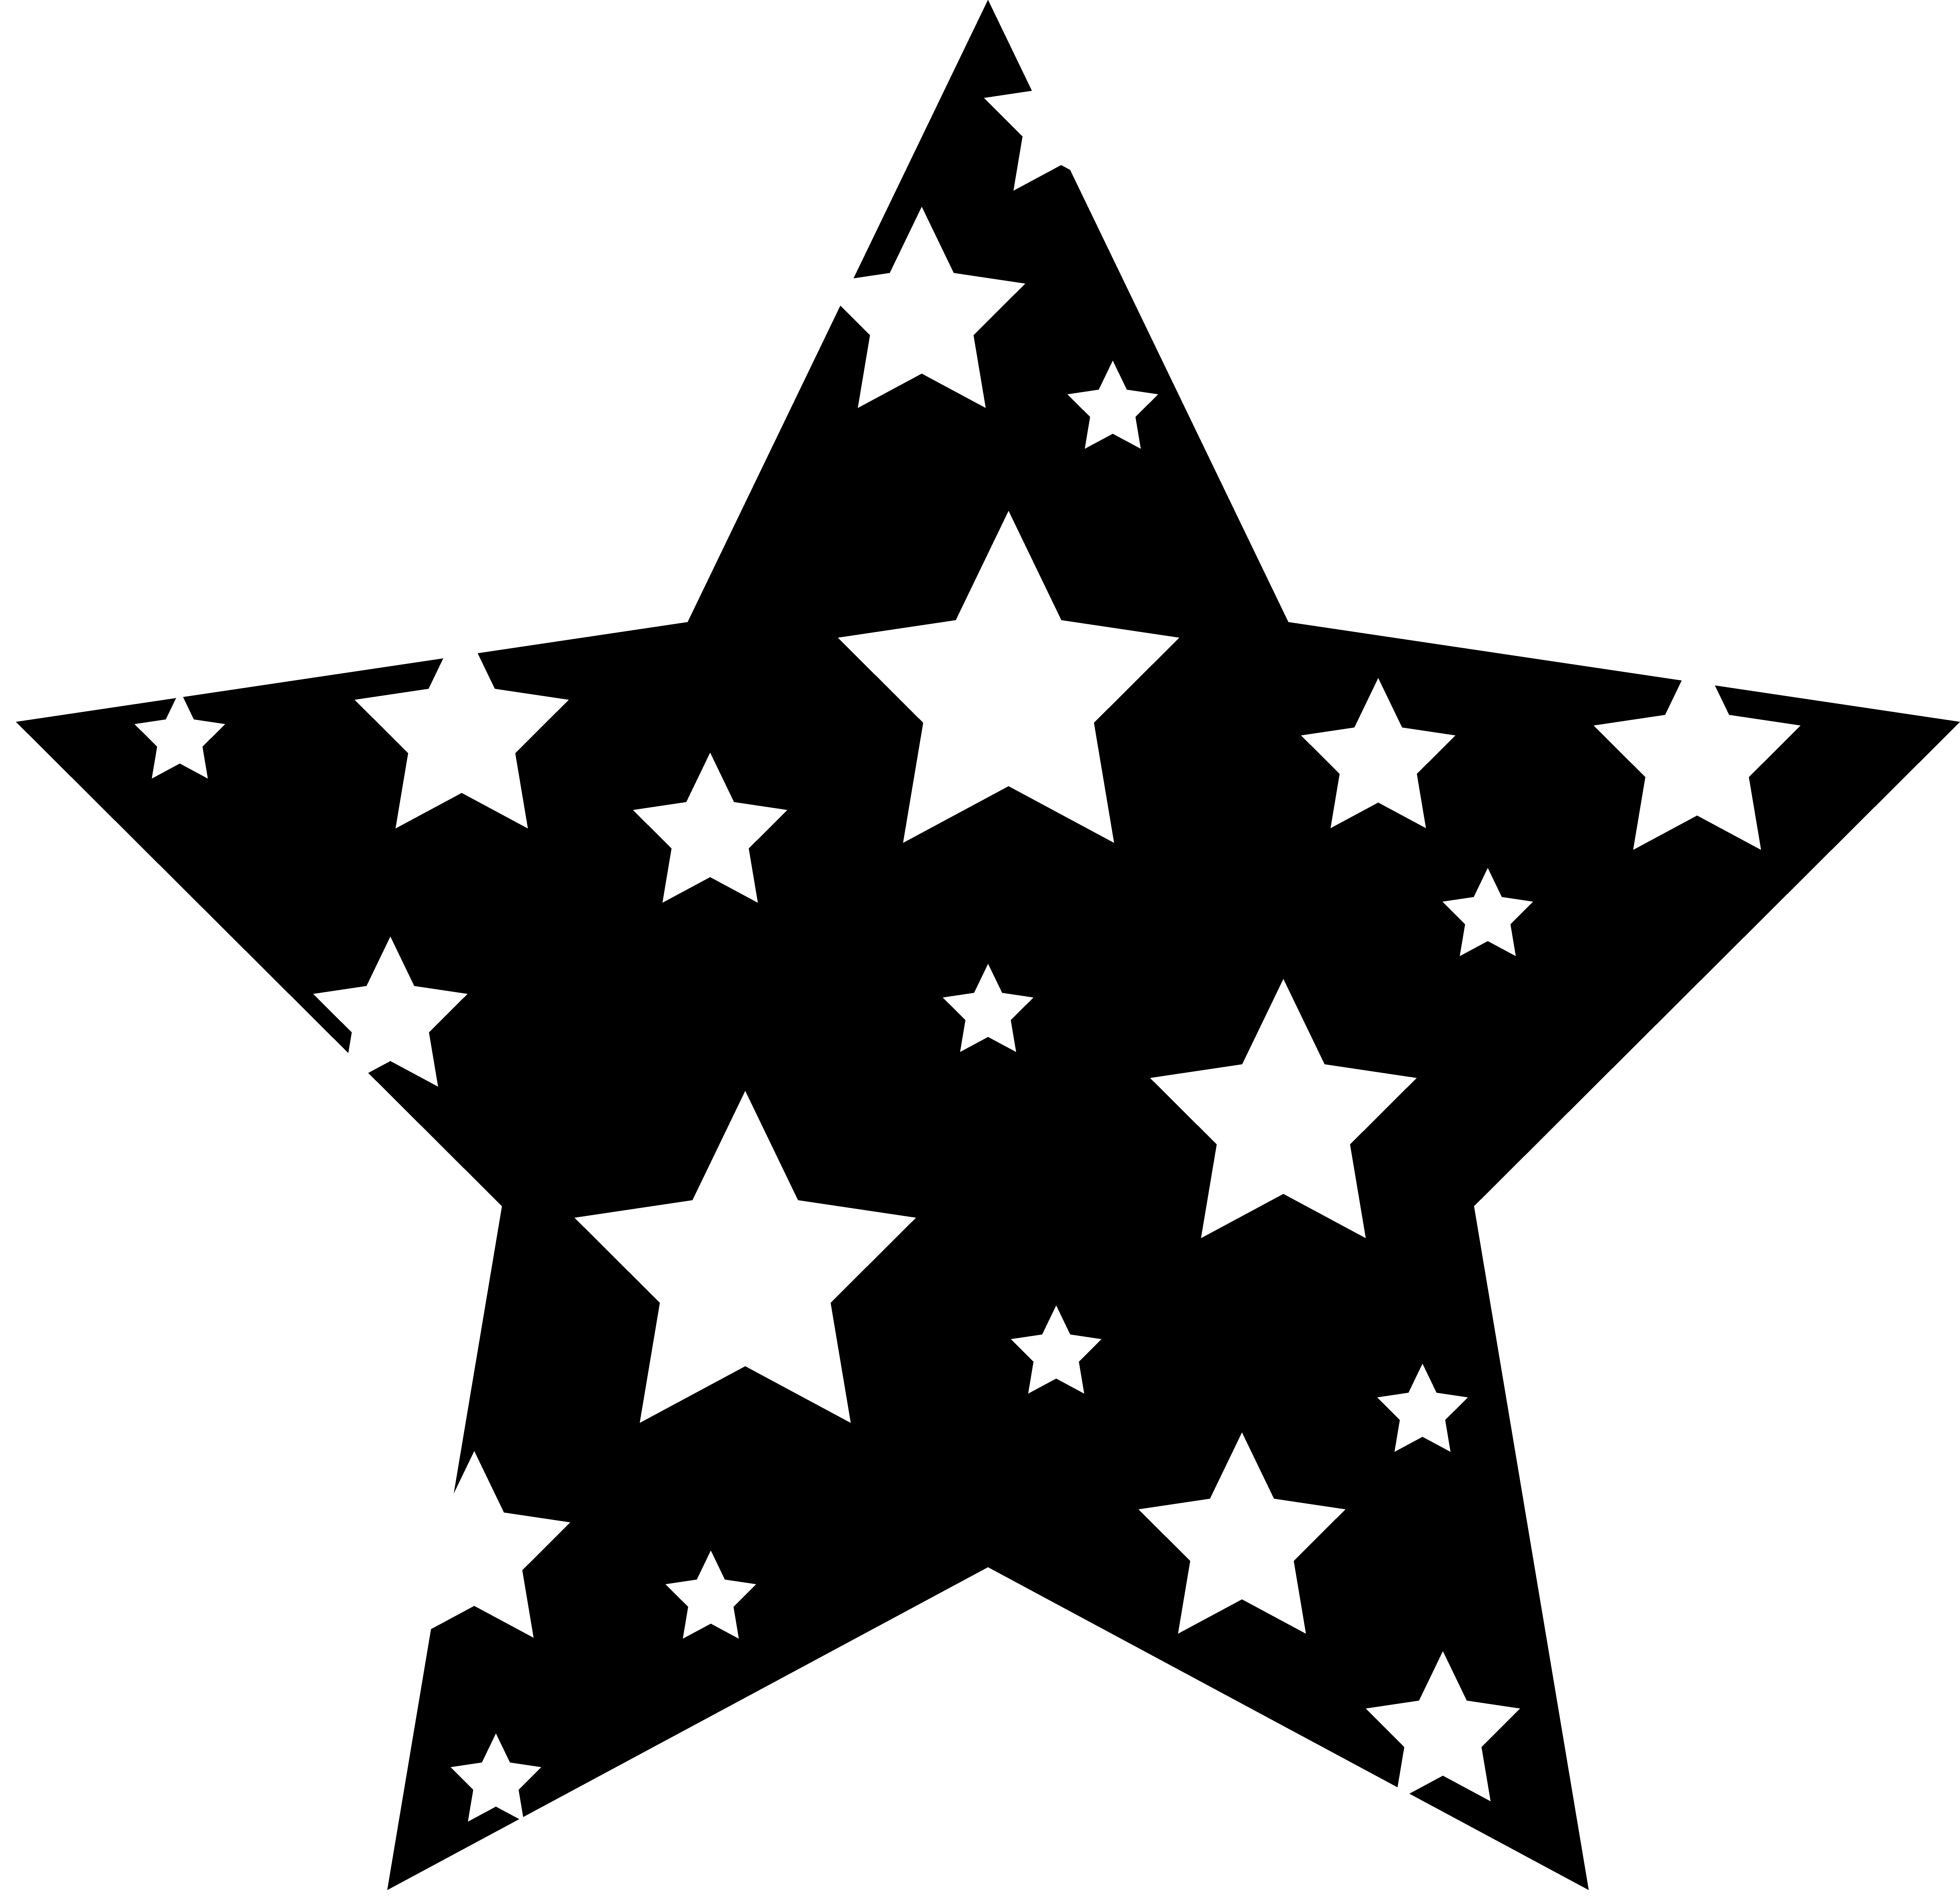 Trout clipart black and white. Star clip art panda